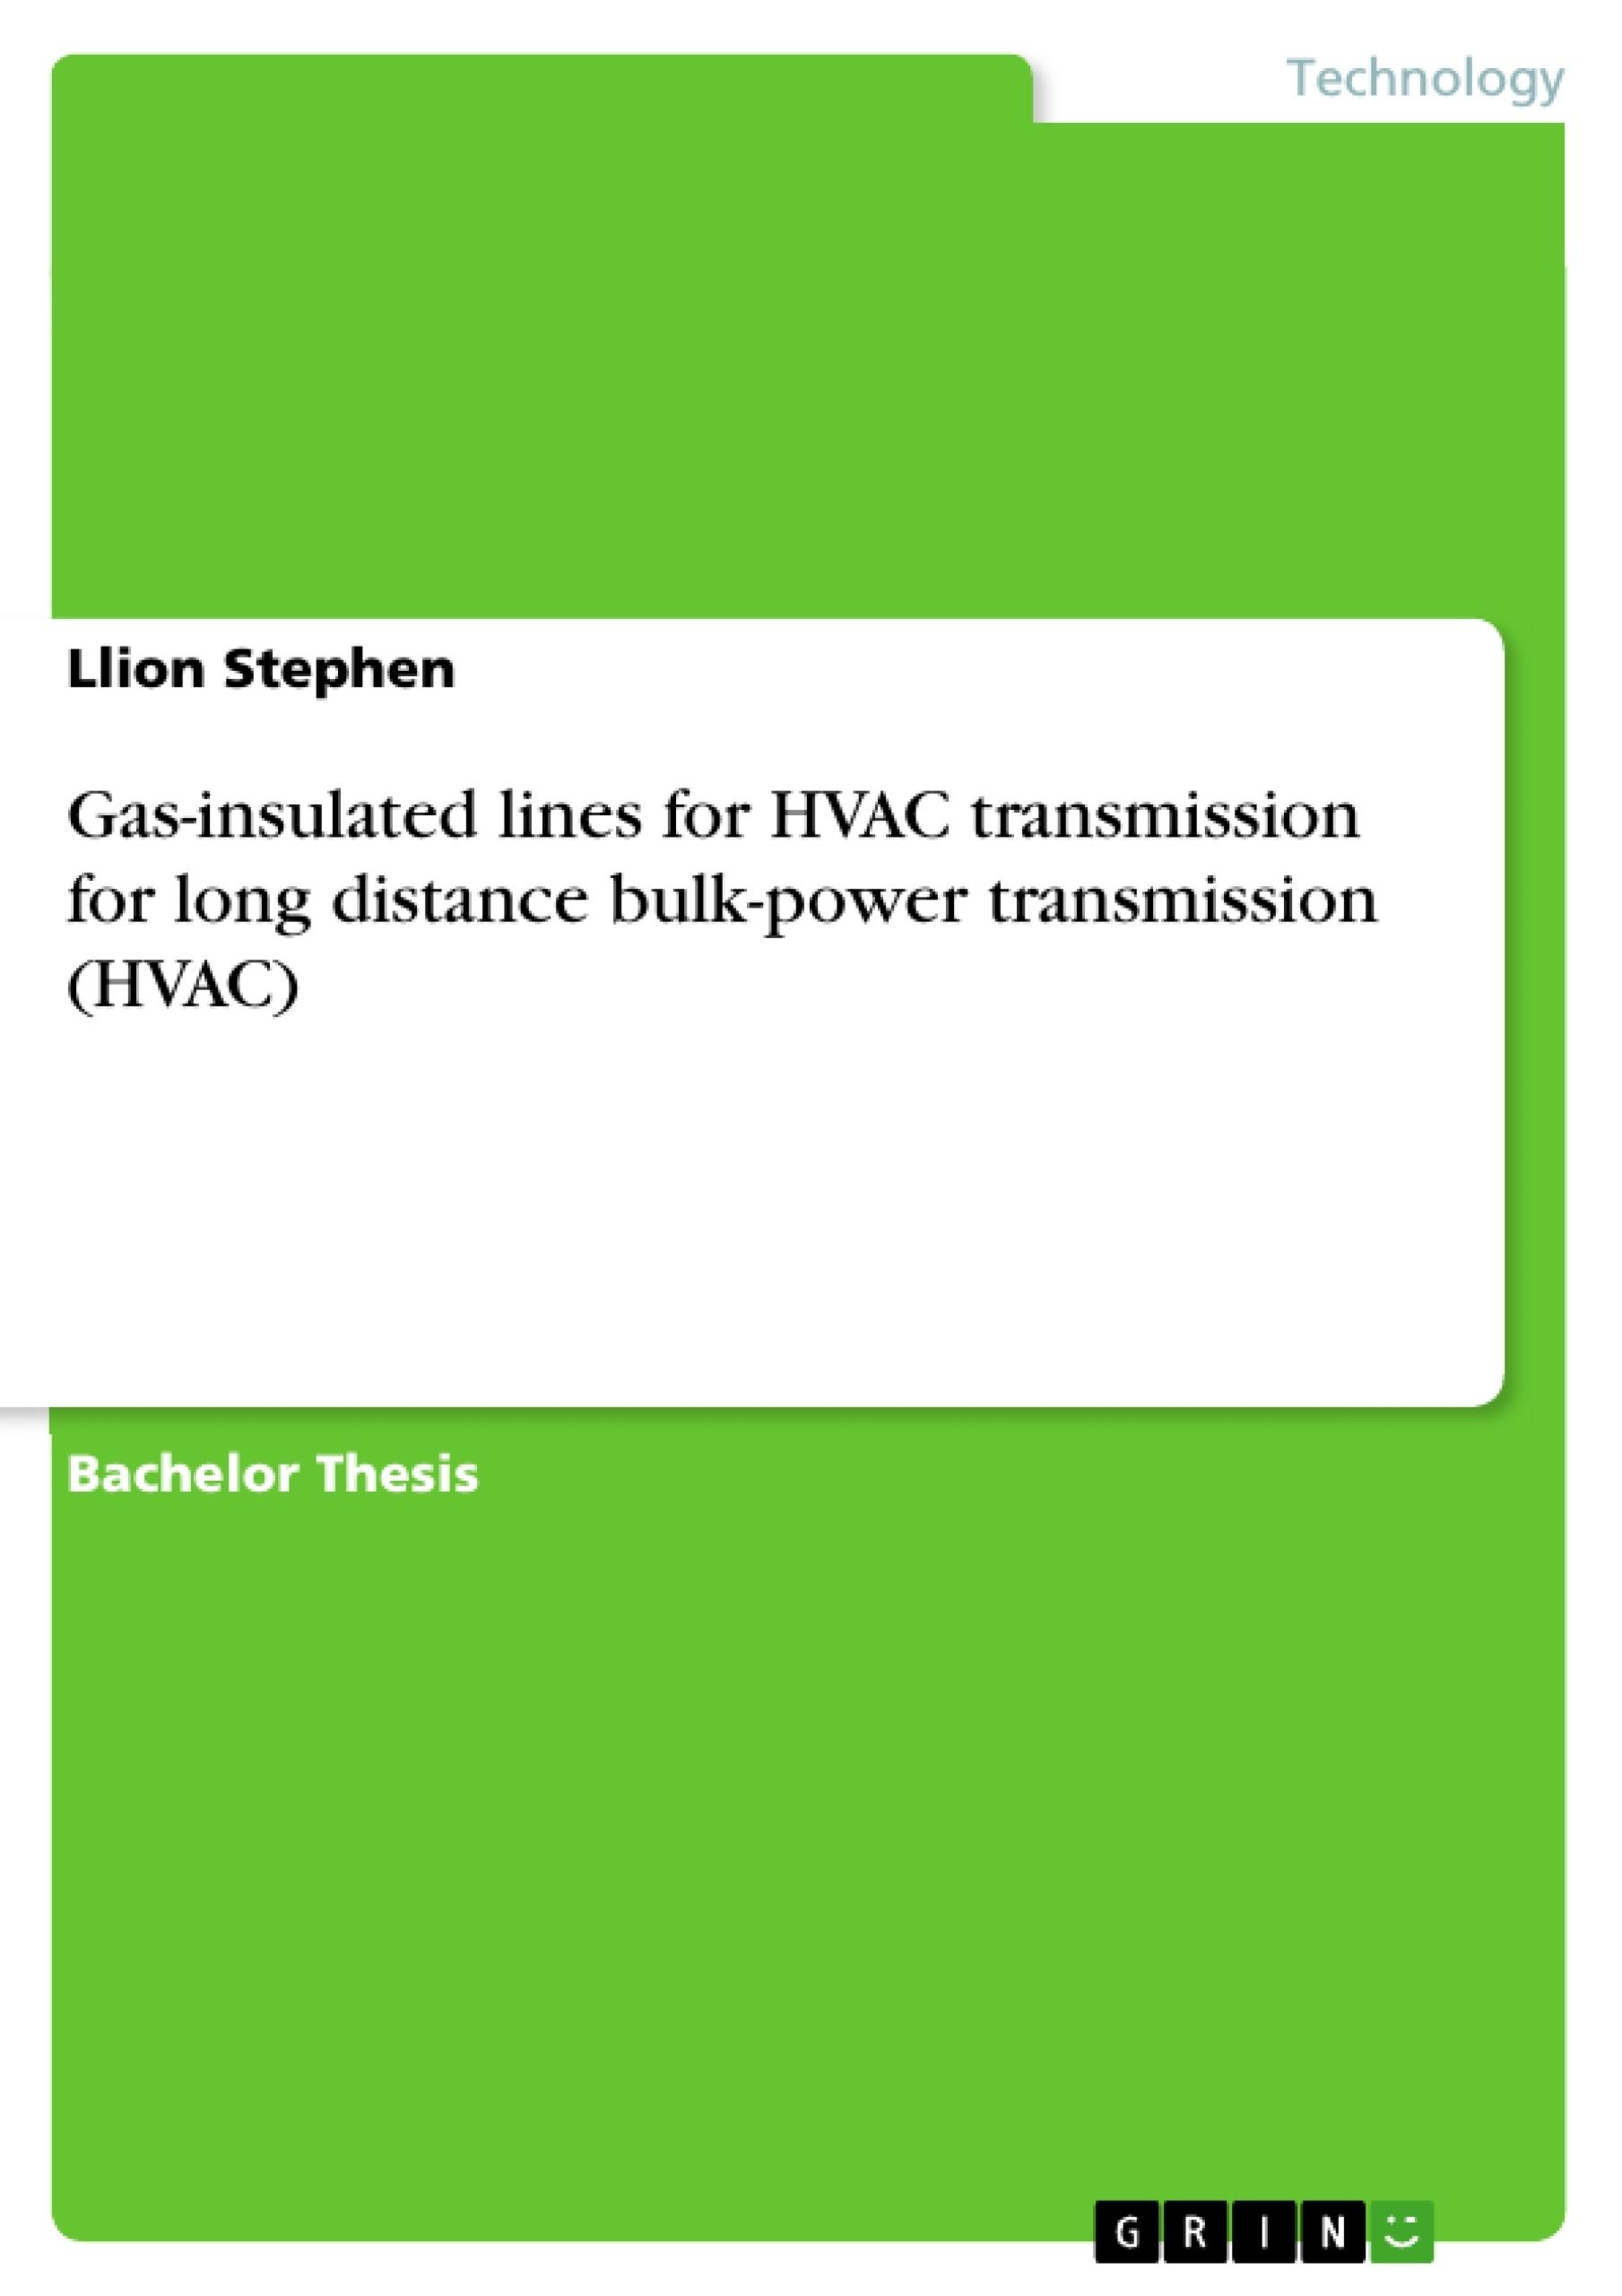 Title: Gas-insulated lines for HVAC transmission for long distance bulk-power transmission (HVAC)